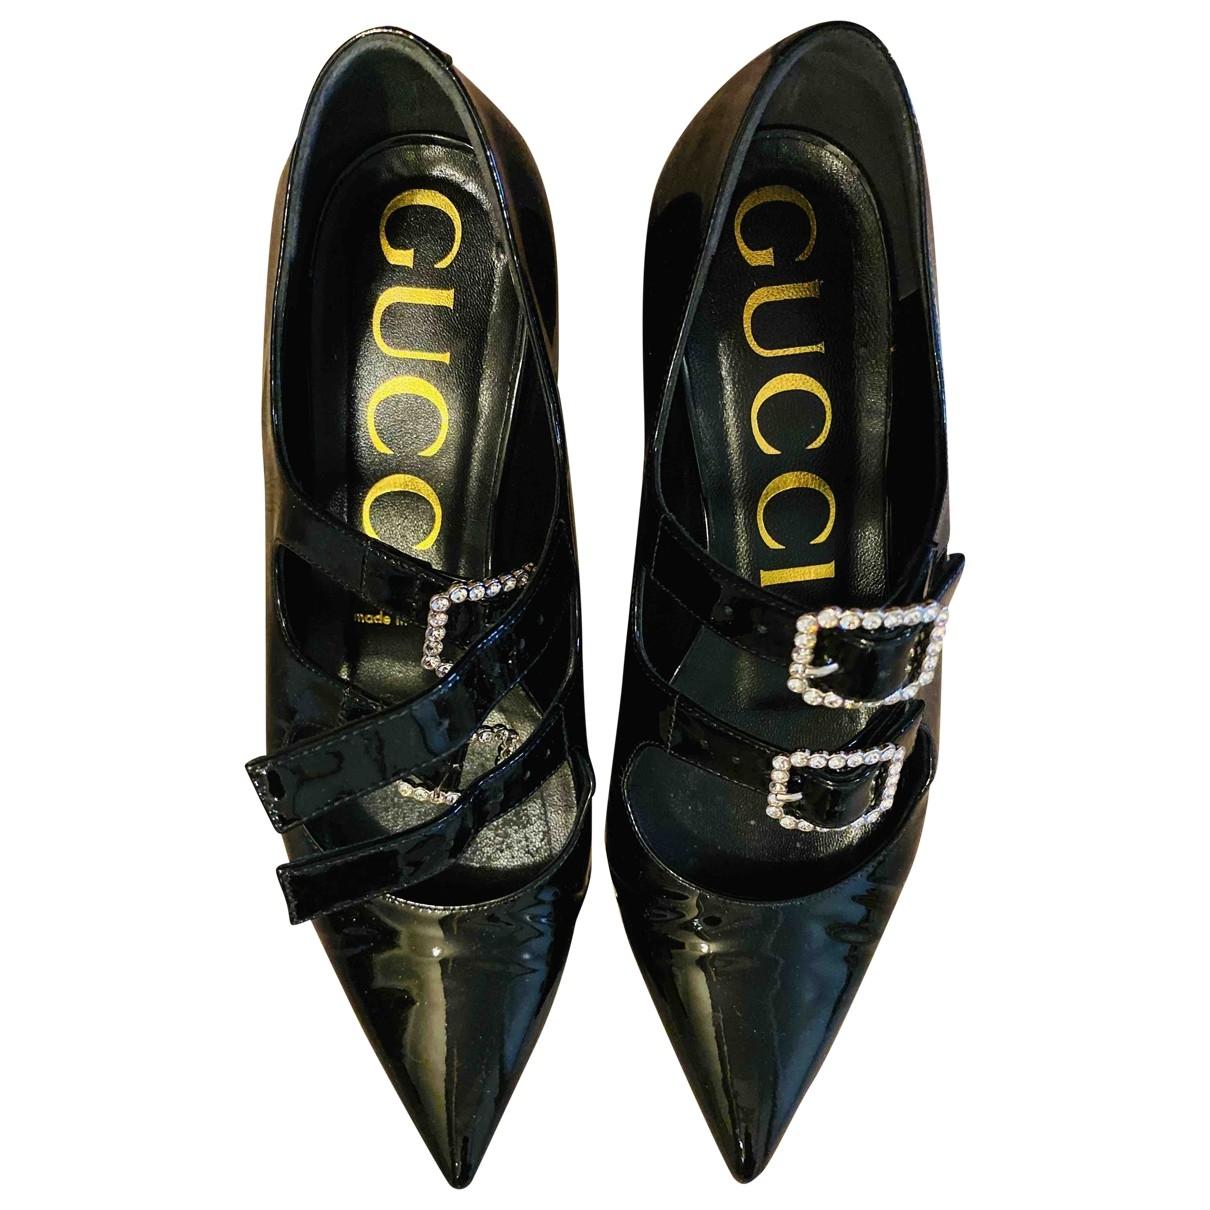 Gucci \N Black Patent leather Flats for Women 38.5 EU